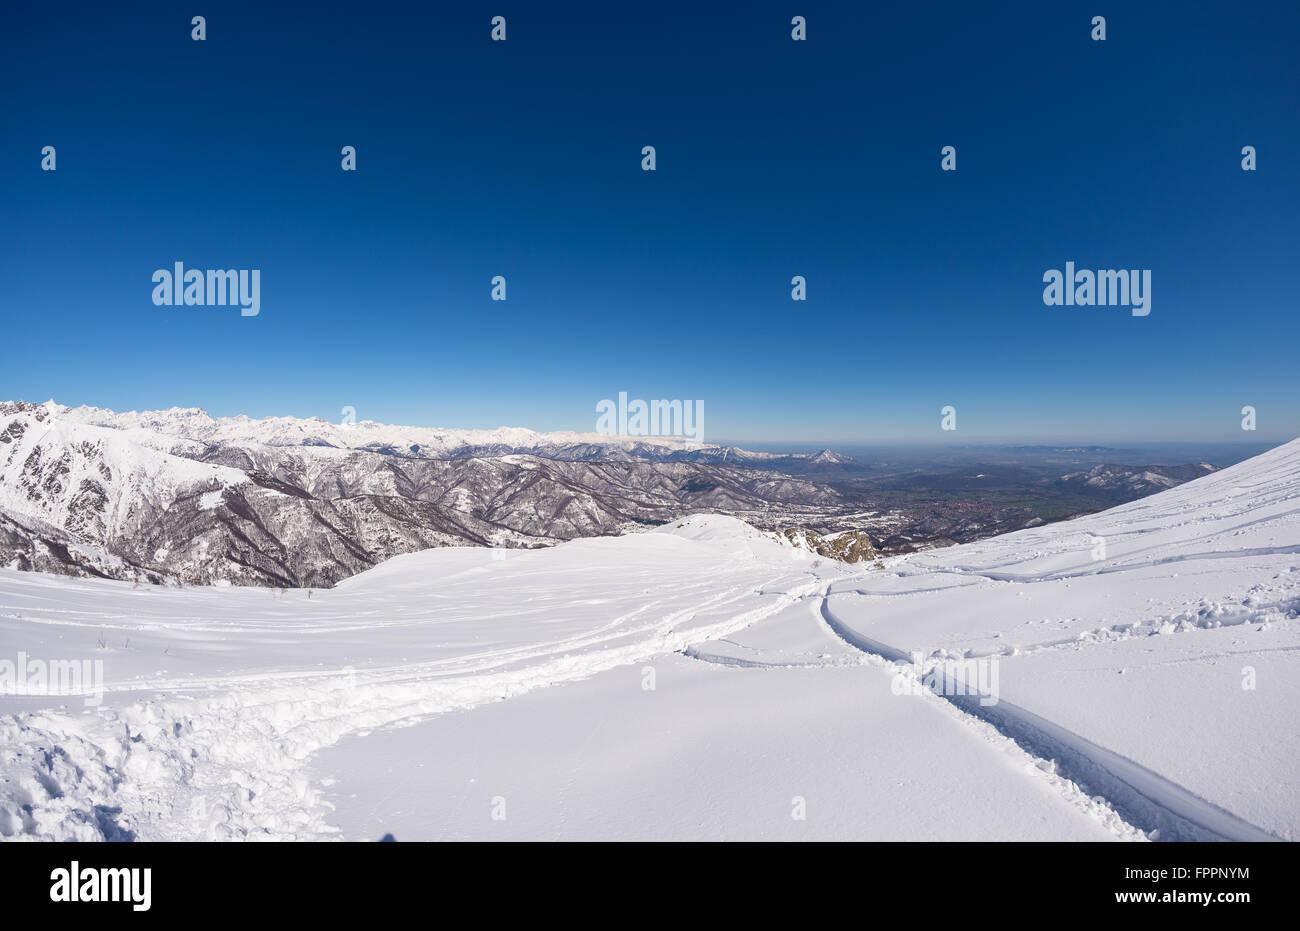 Free ride ski tracks on snowy slope  Fresh powder snow in a bright